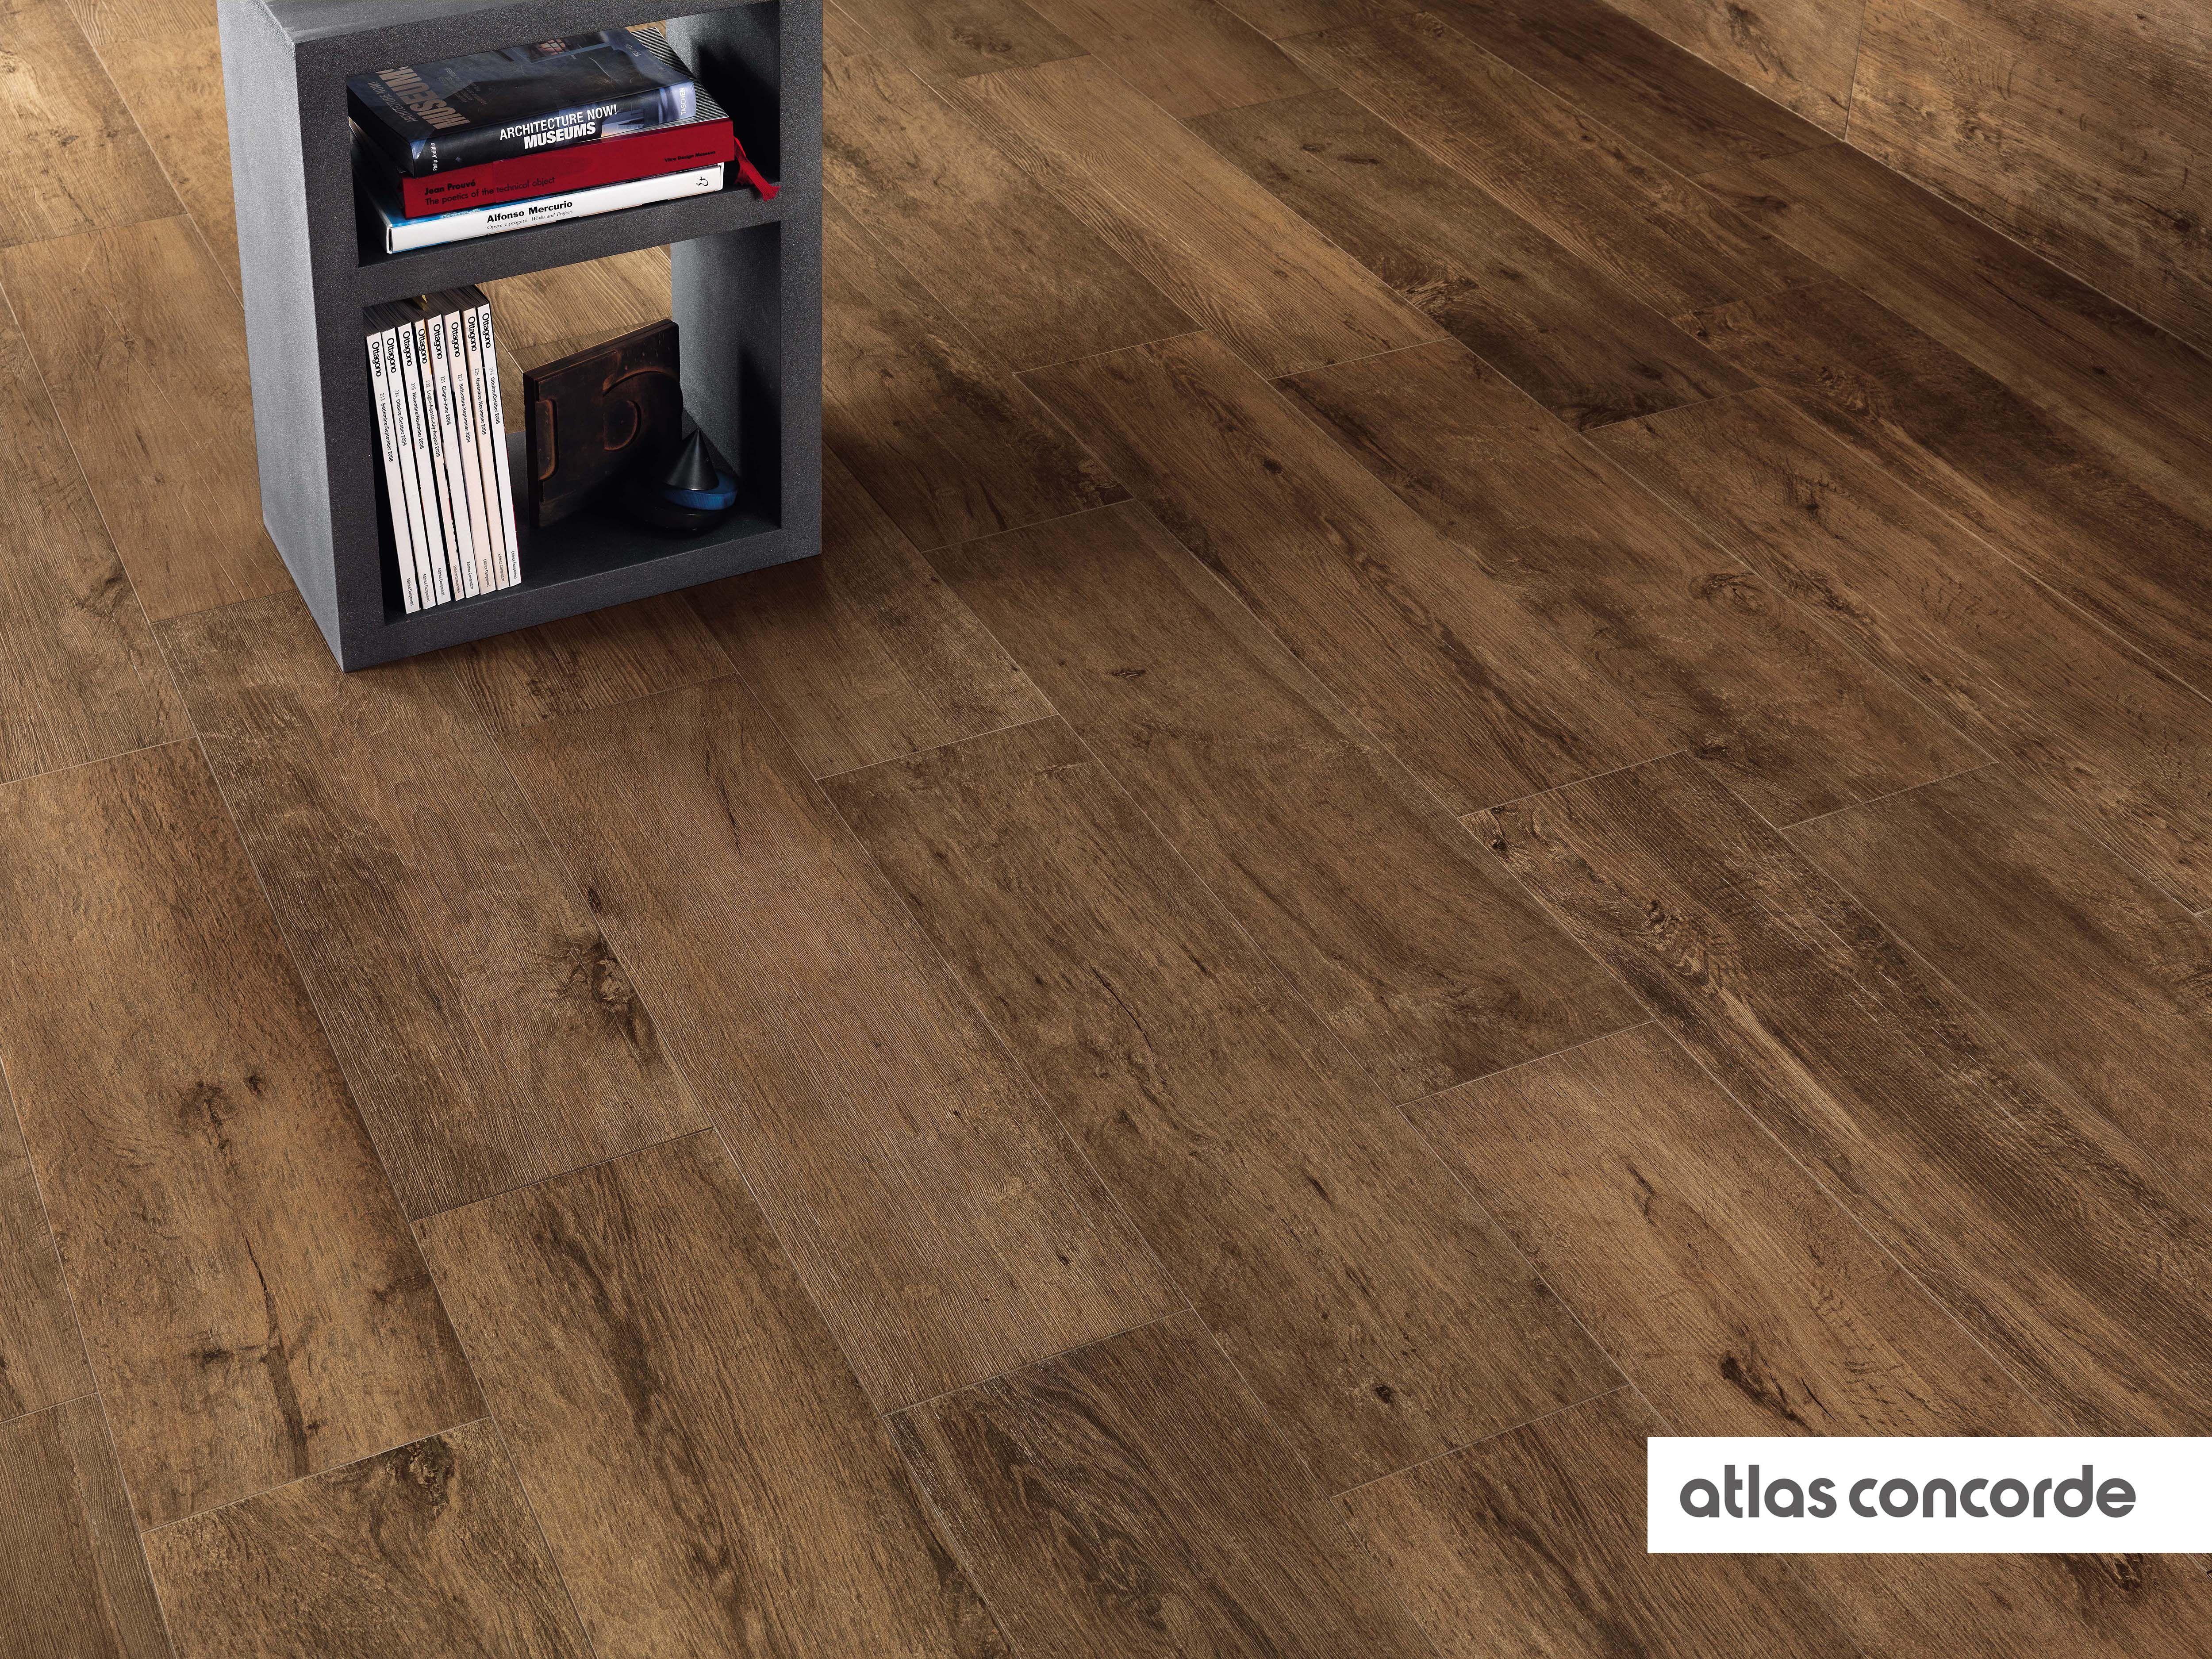 Collections concorde axi atlas concorde wood look porcelain tiles golden oak matt dailygadgetfo Image collections